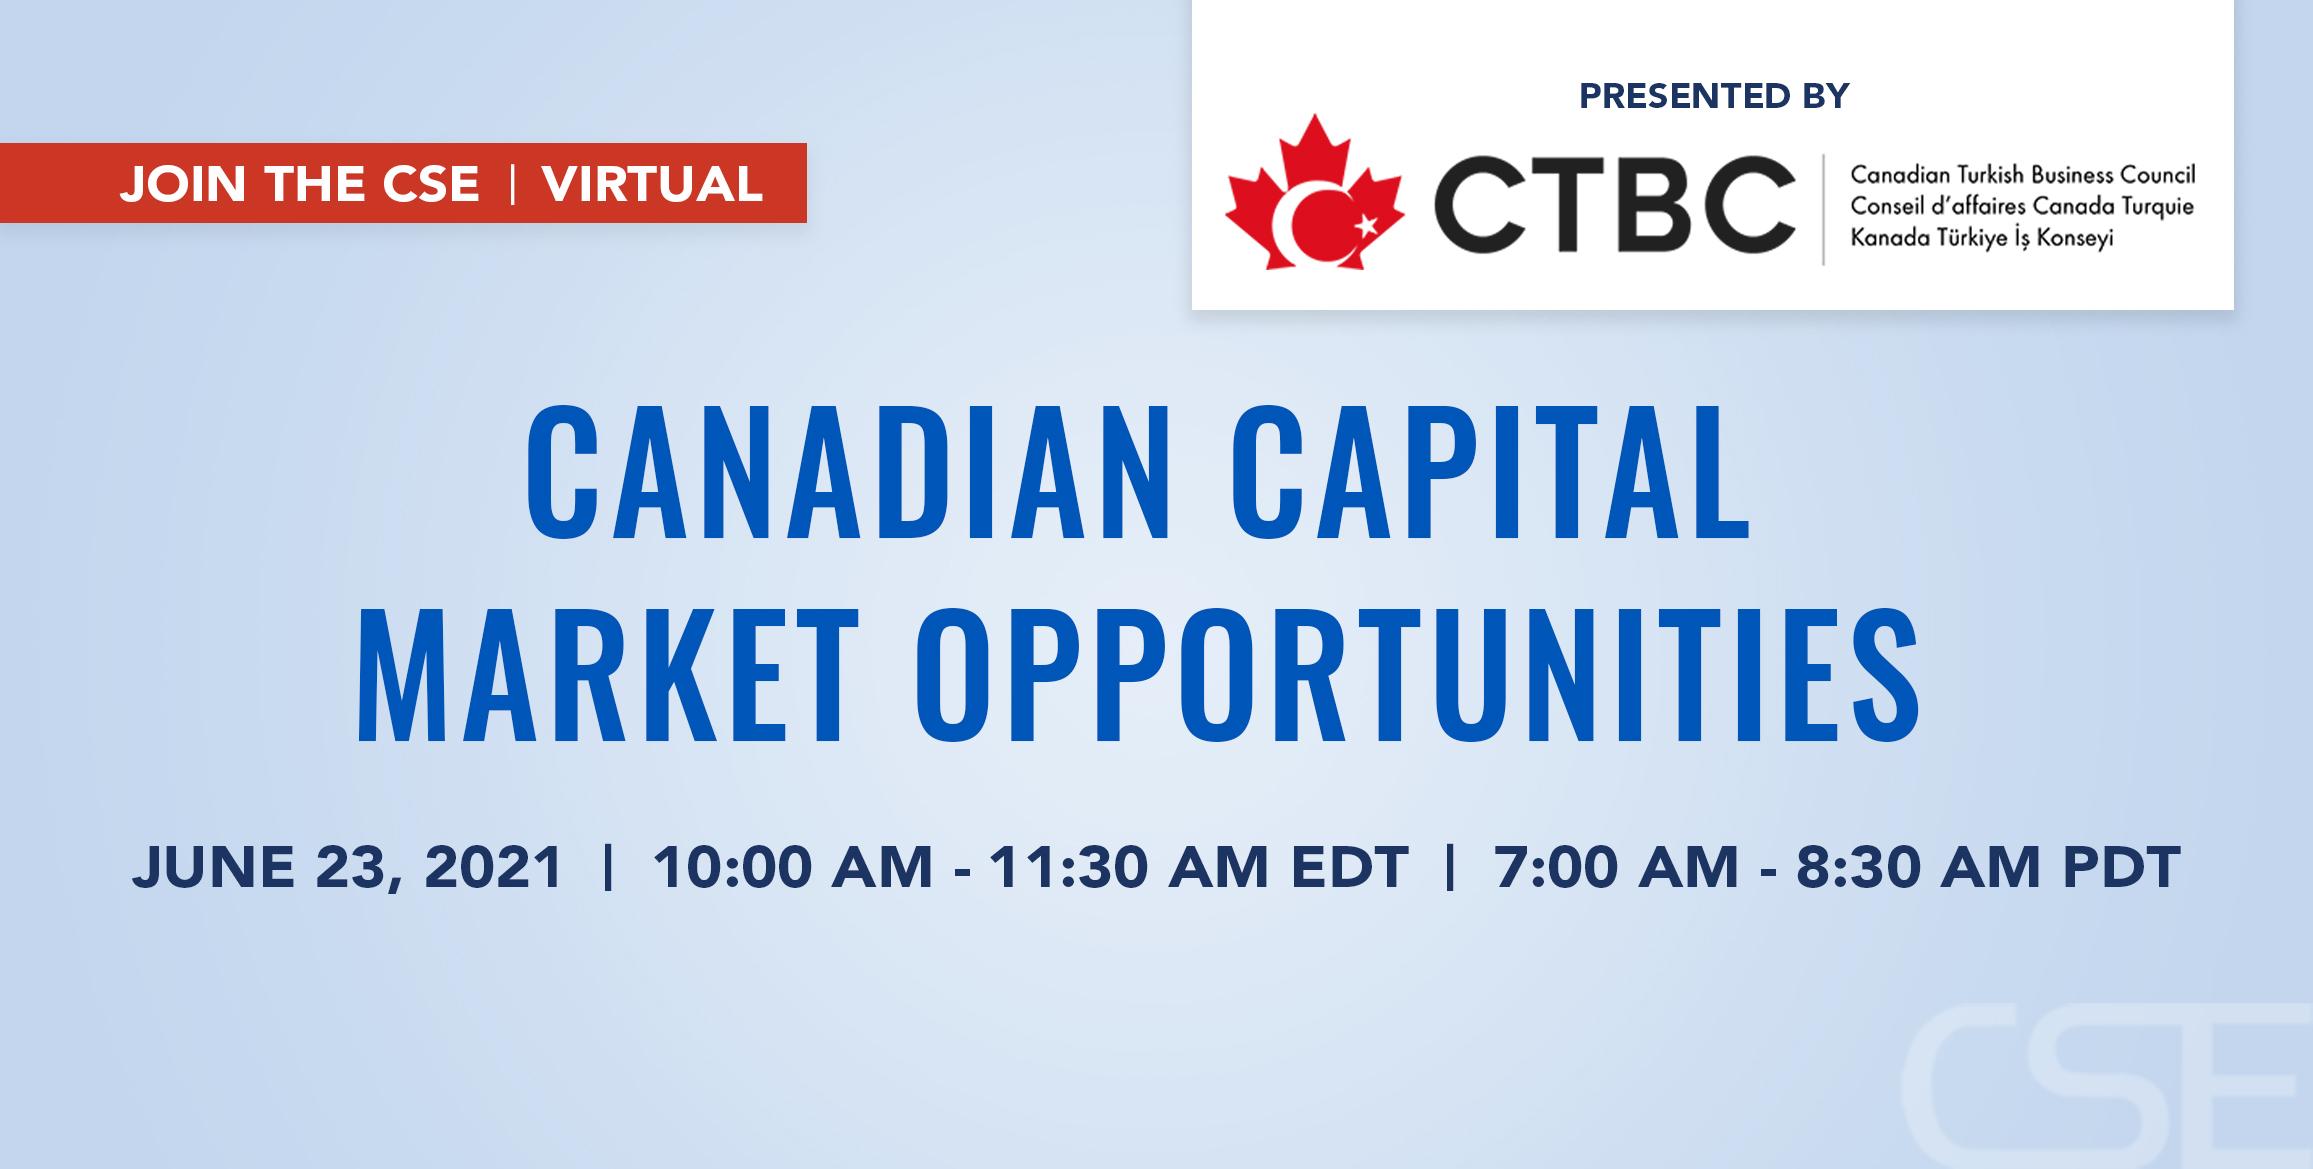 2021-06-23-Canadian-Capital-Market-Opportunities_Website_V3.jpg